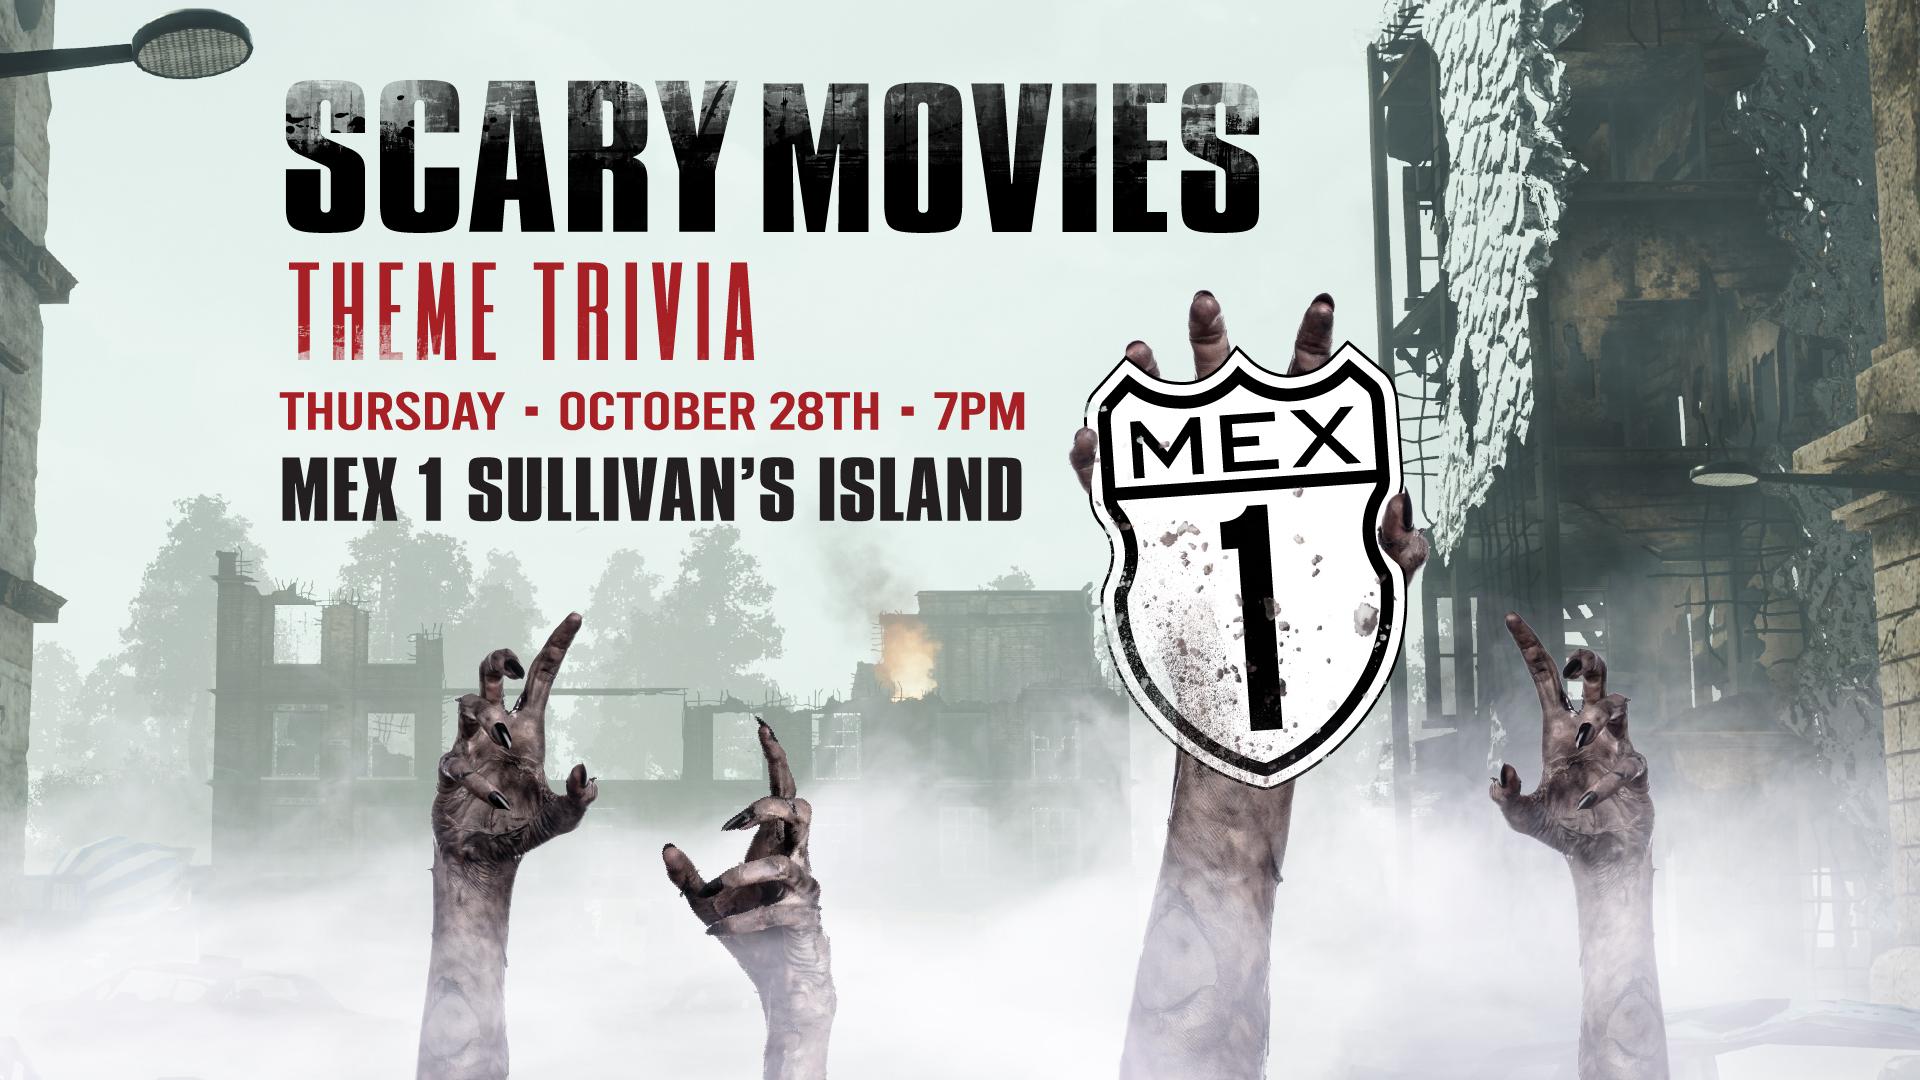 Scary Movies Themed Trivia